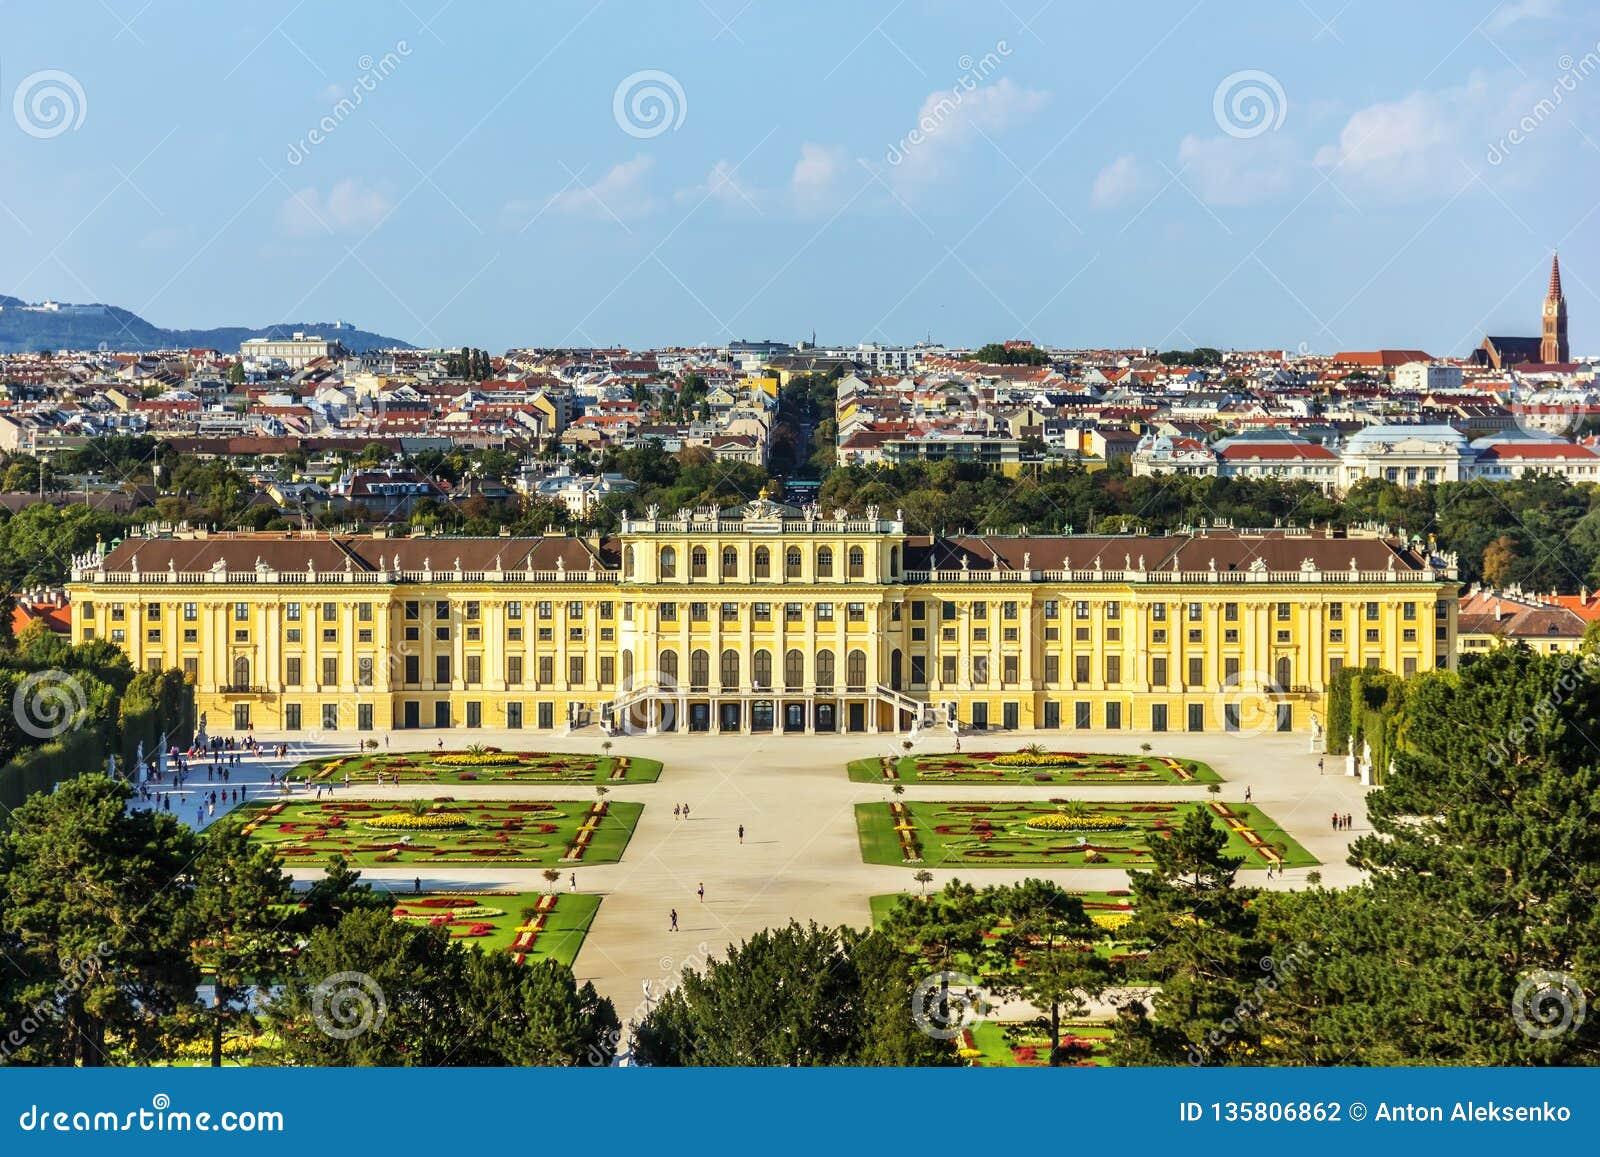 Palazzo di Schonbrunn a Vienna, Austria, a piena vista